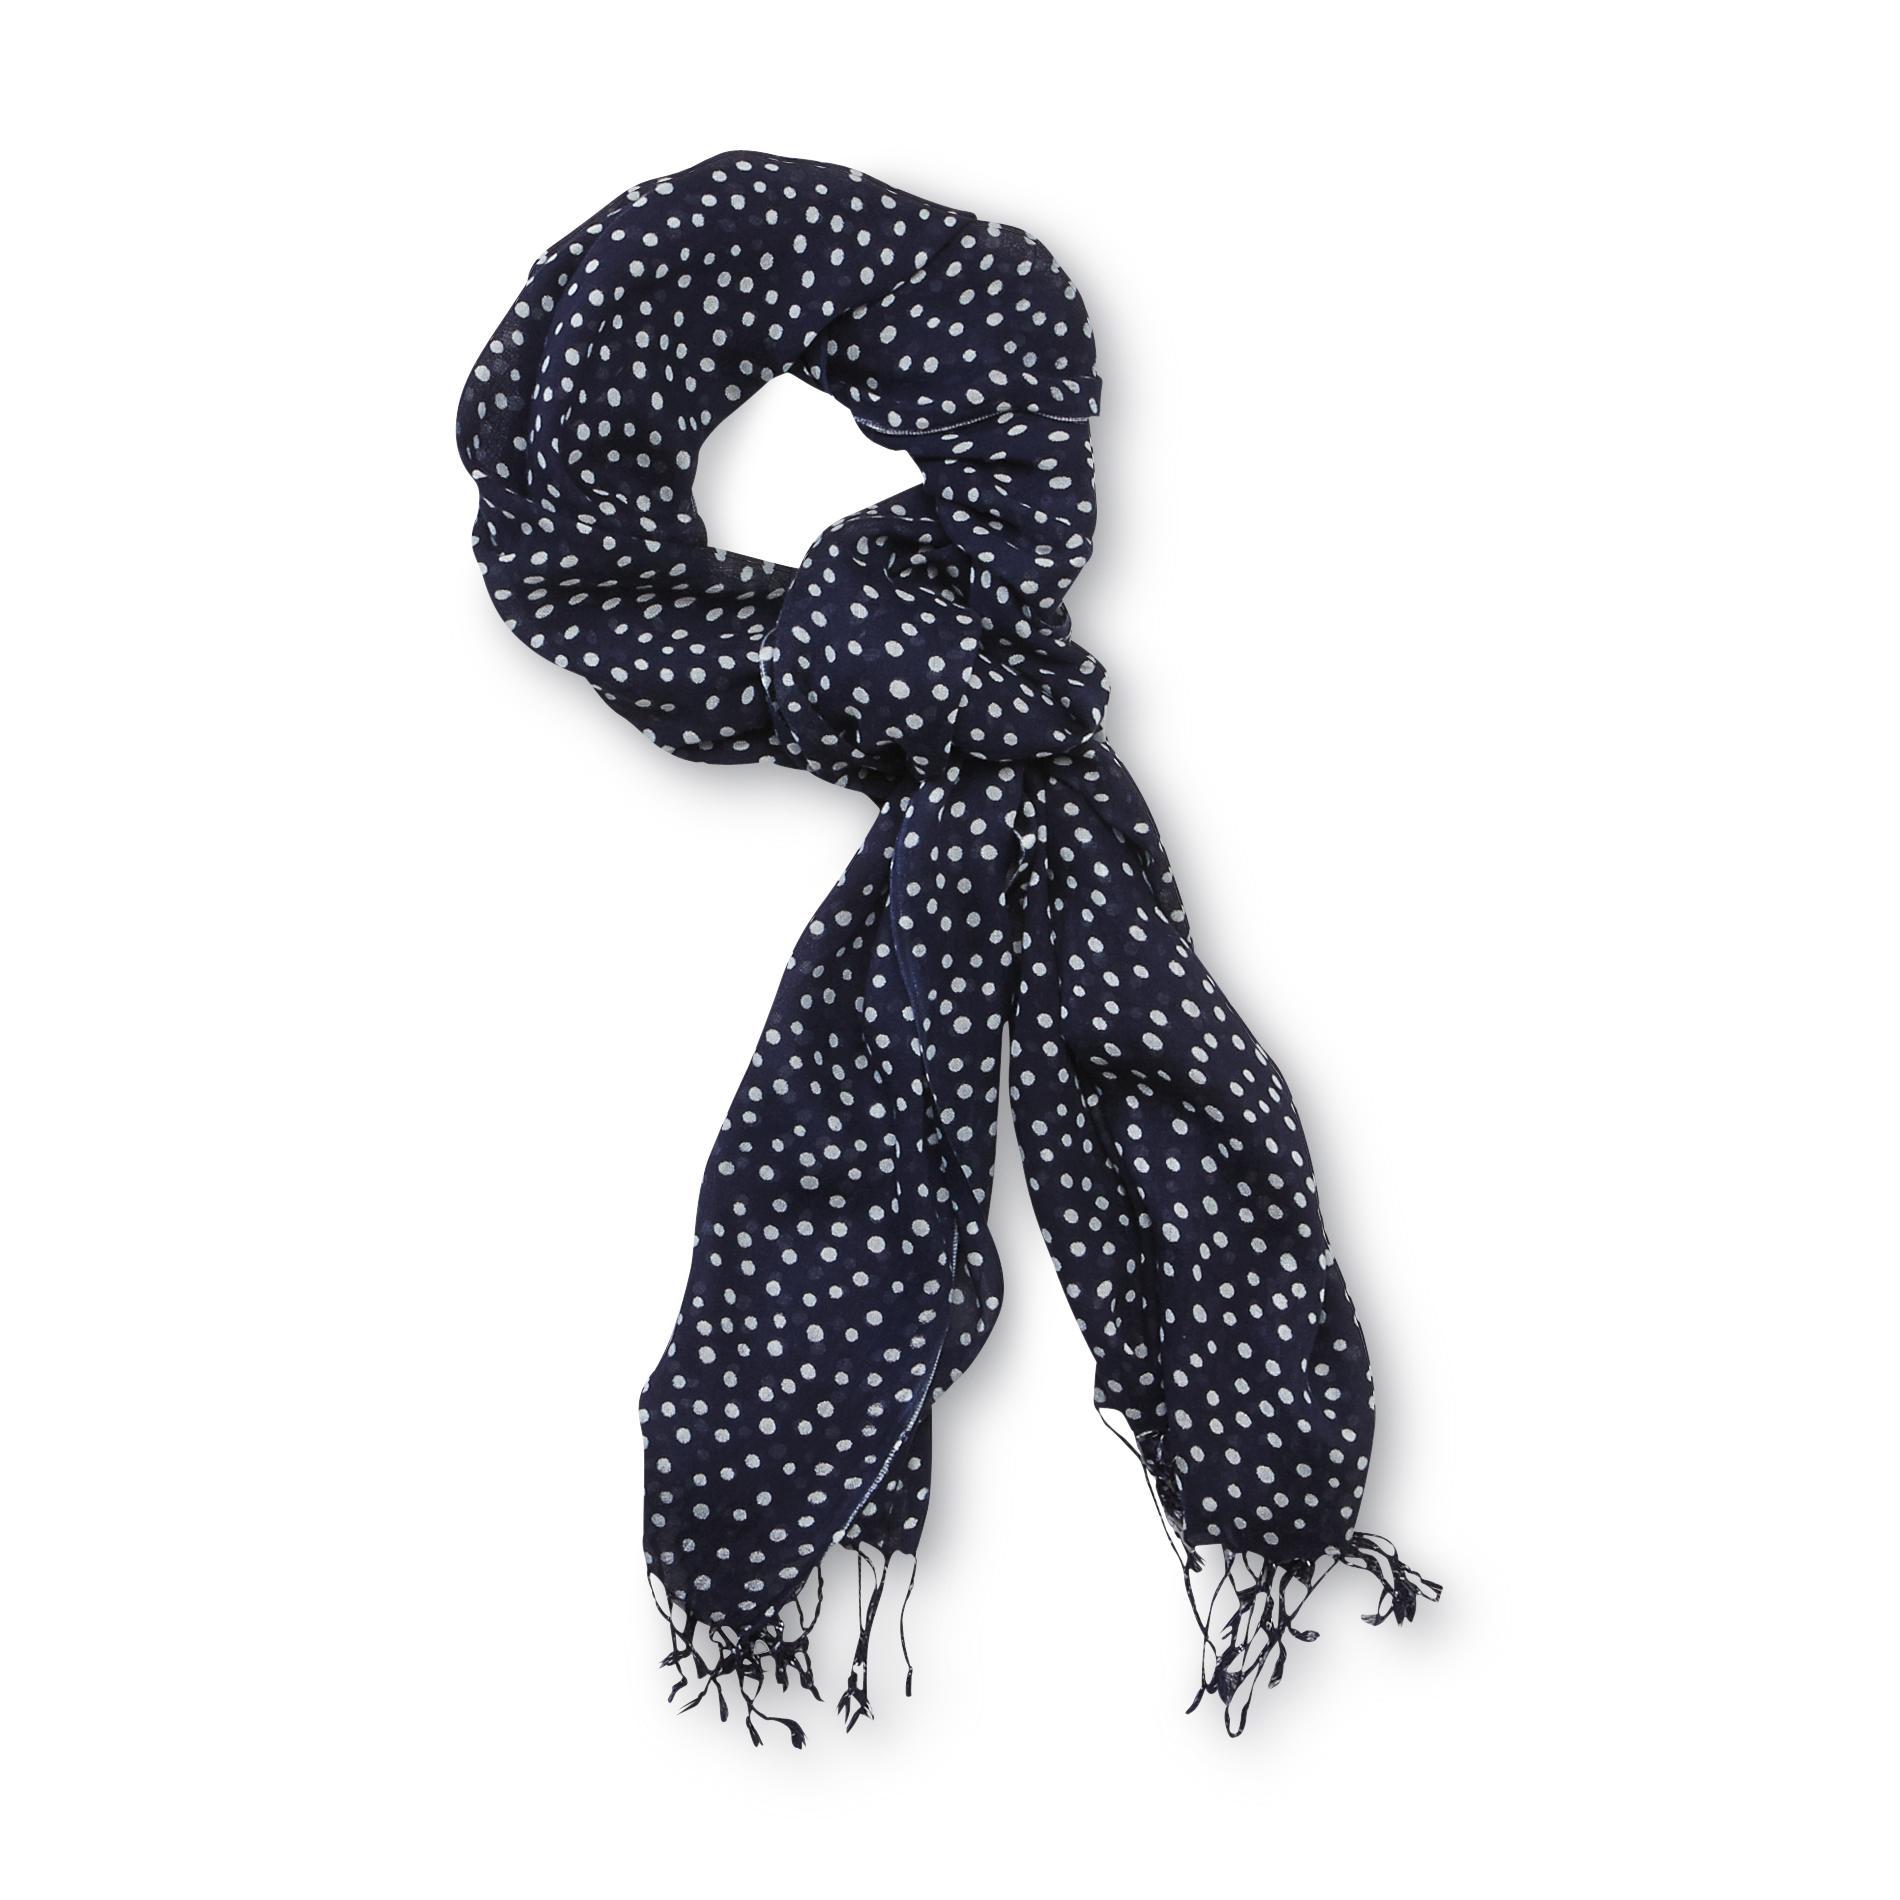 Women's Fashion Scarf - Polka Dot